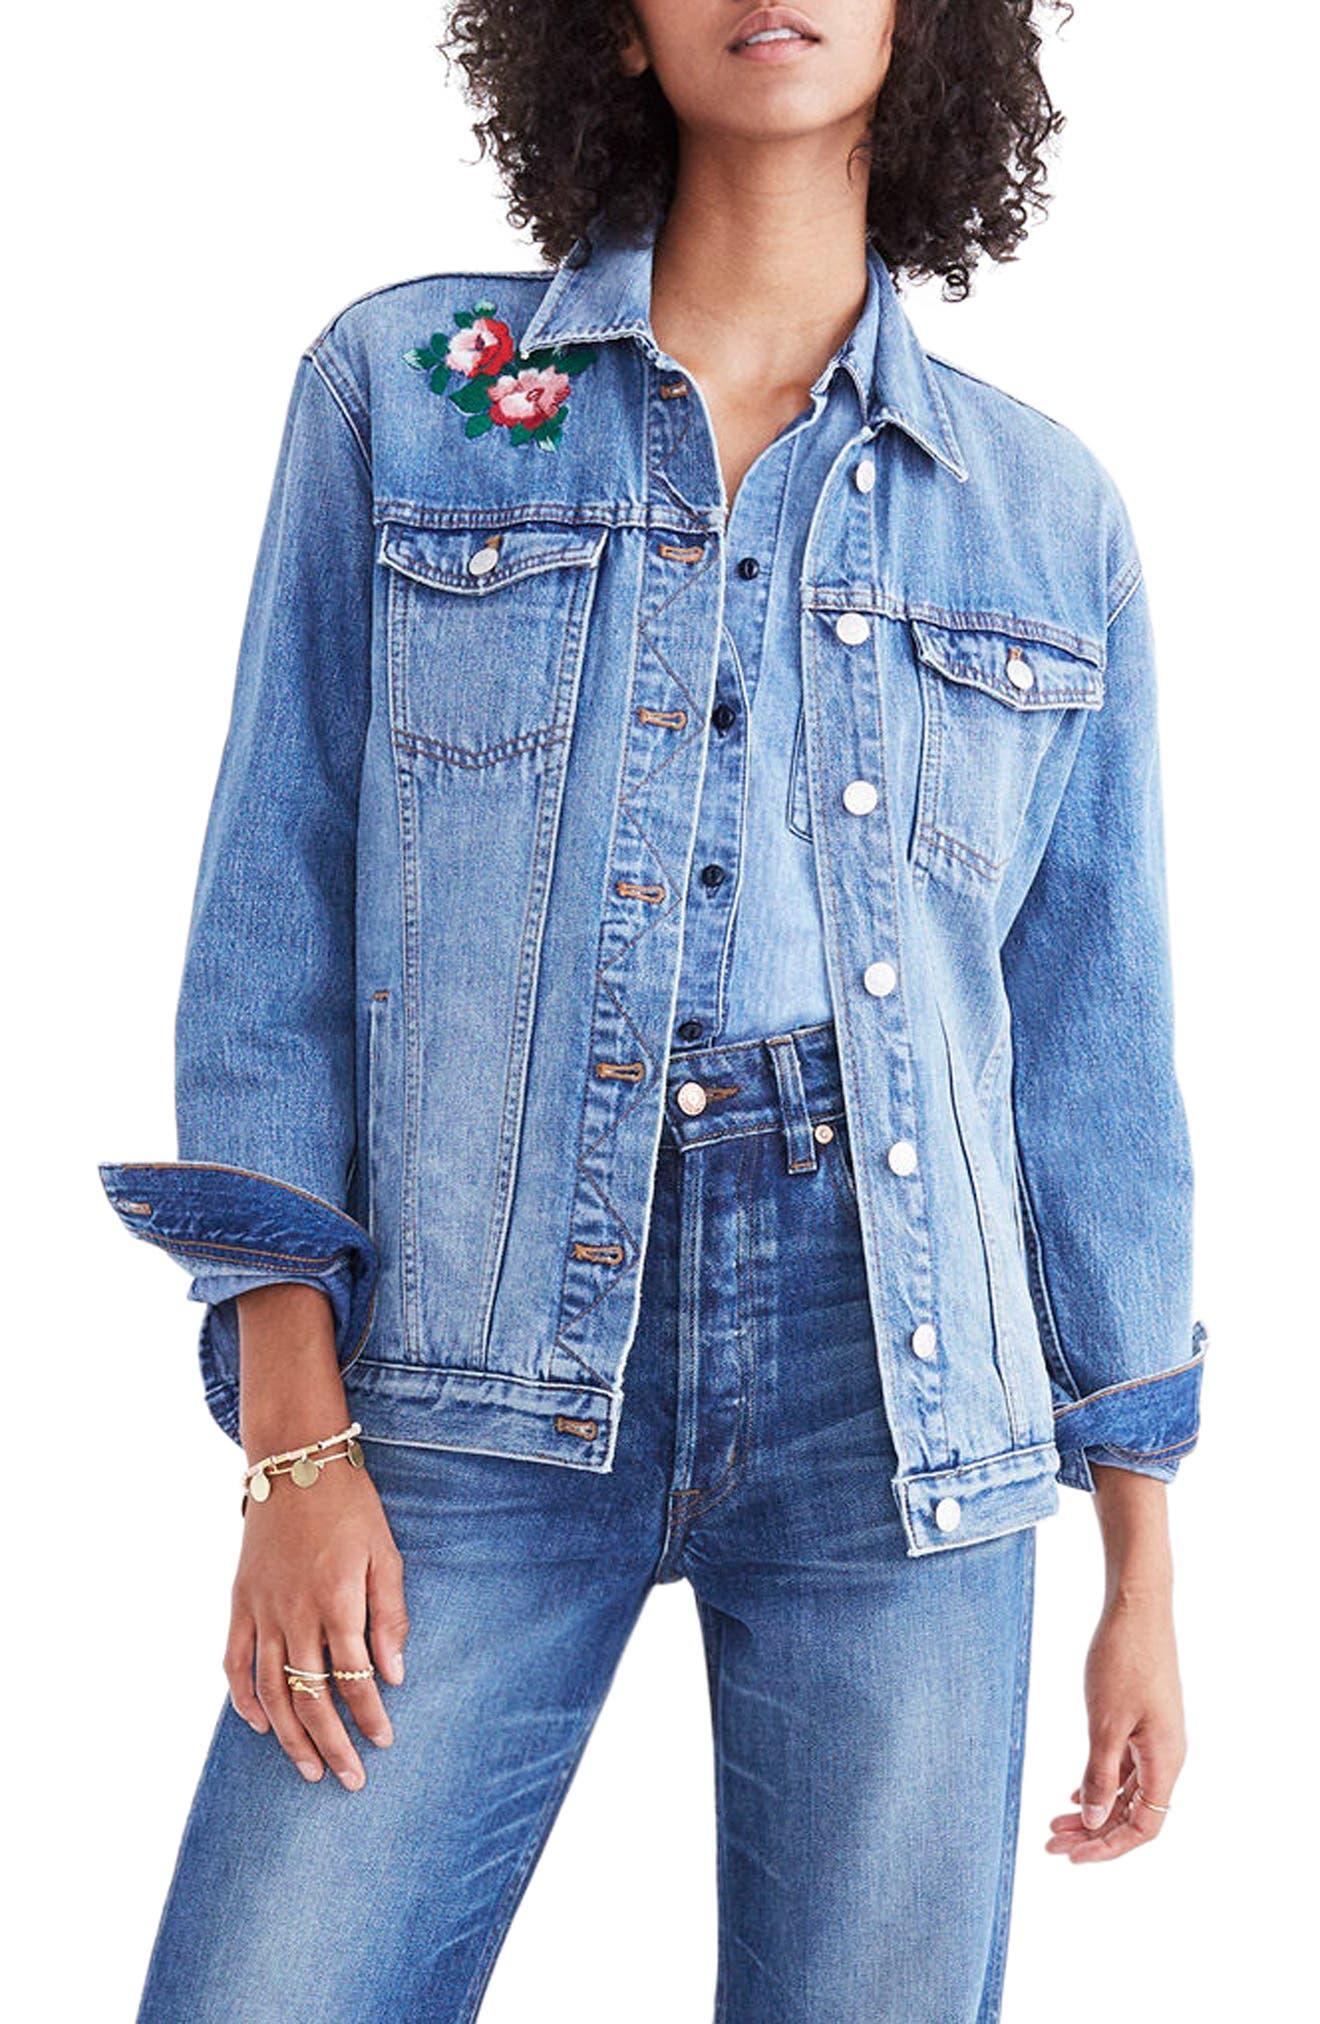 Main Image - Madewell Embroidered Denim Jacket